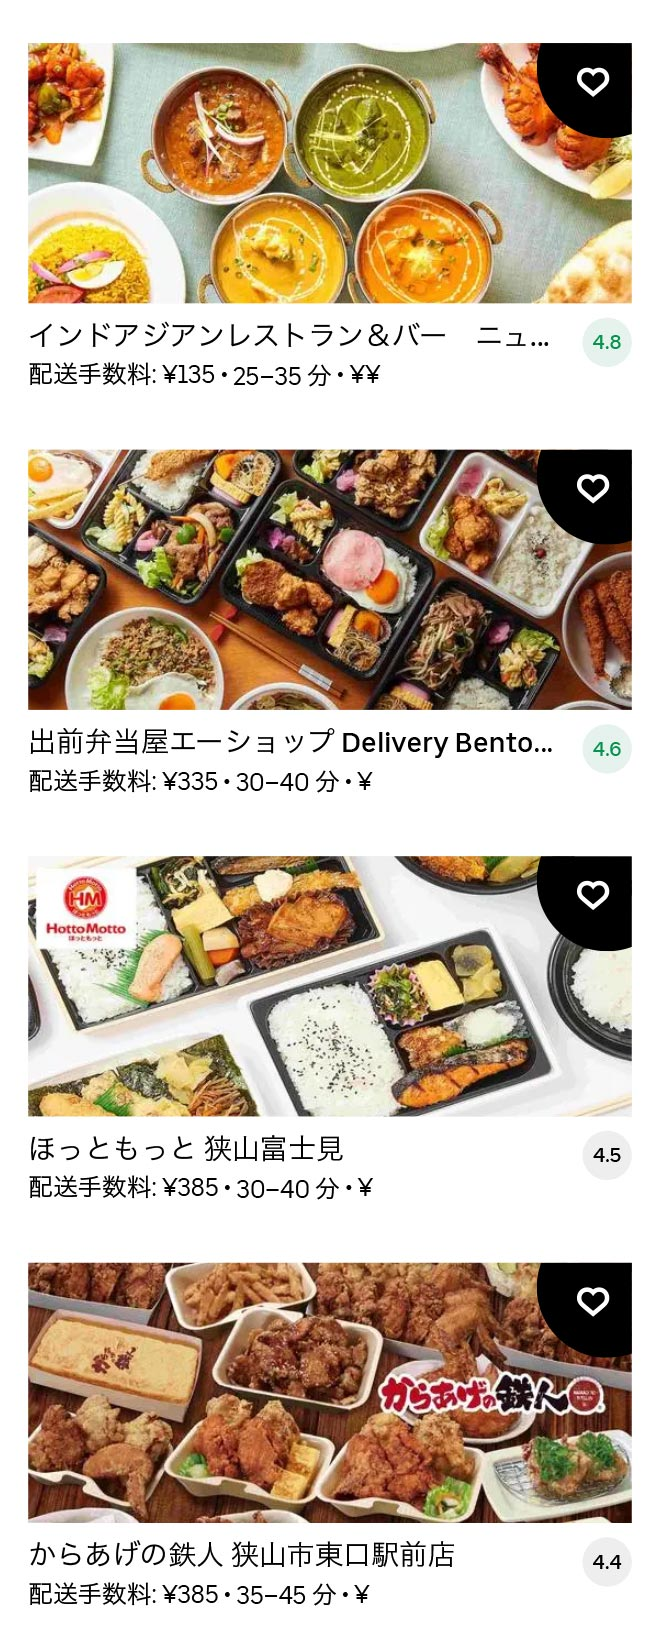 Iruma menu 2101 07